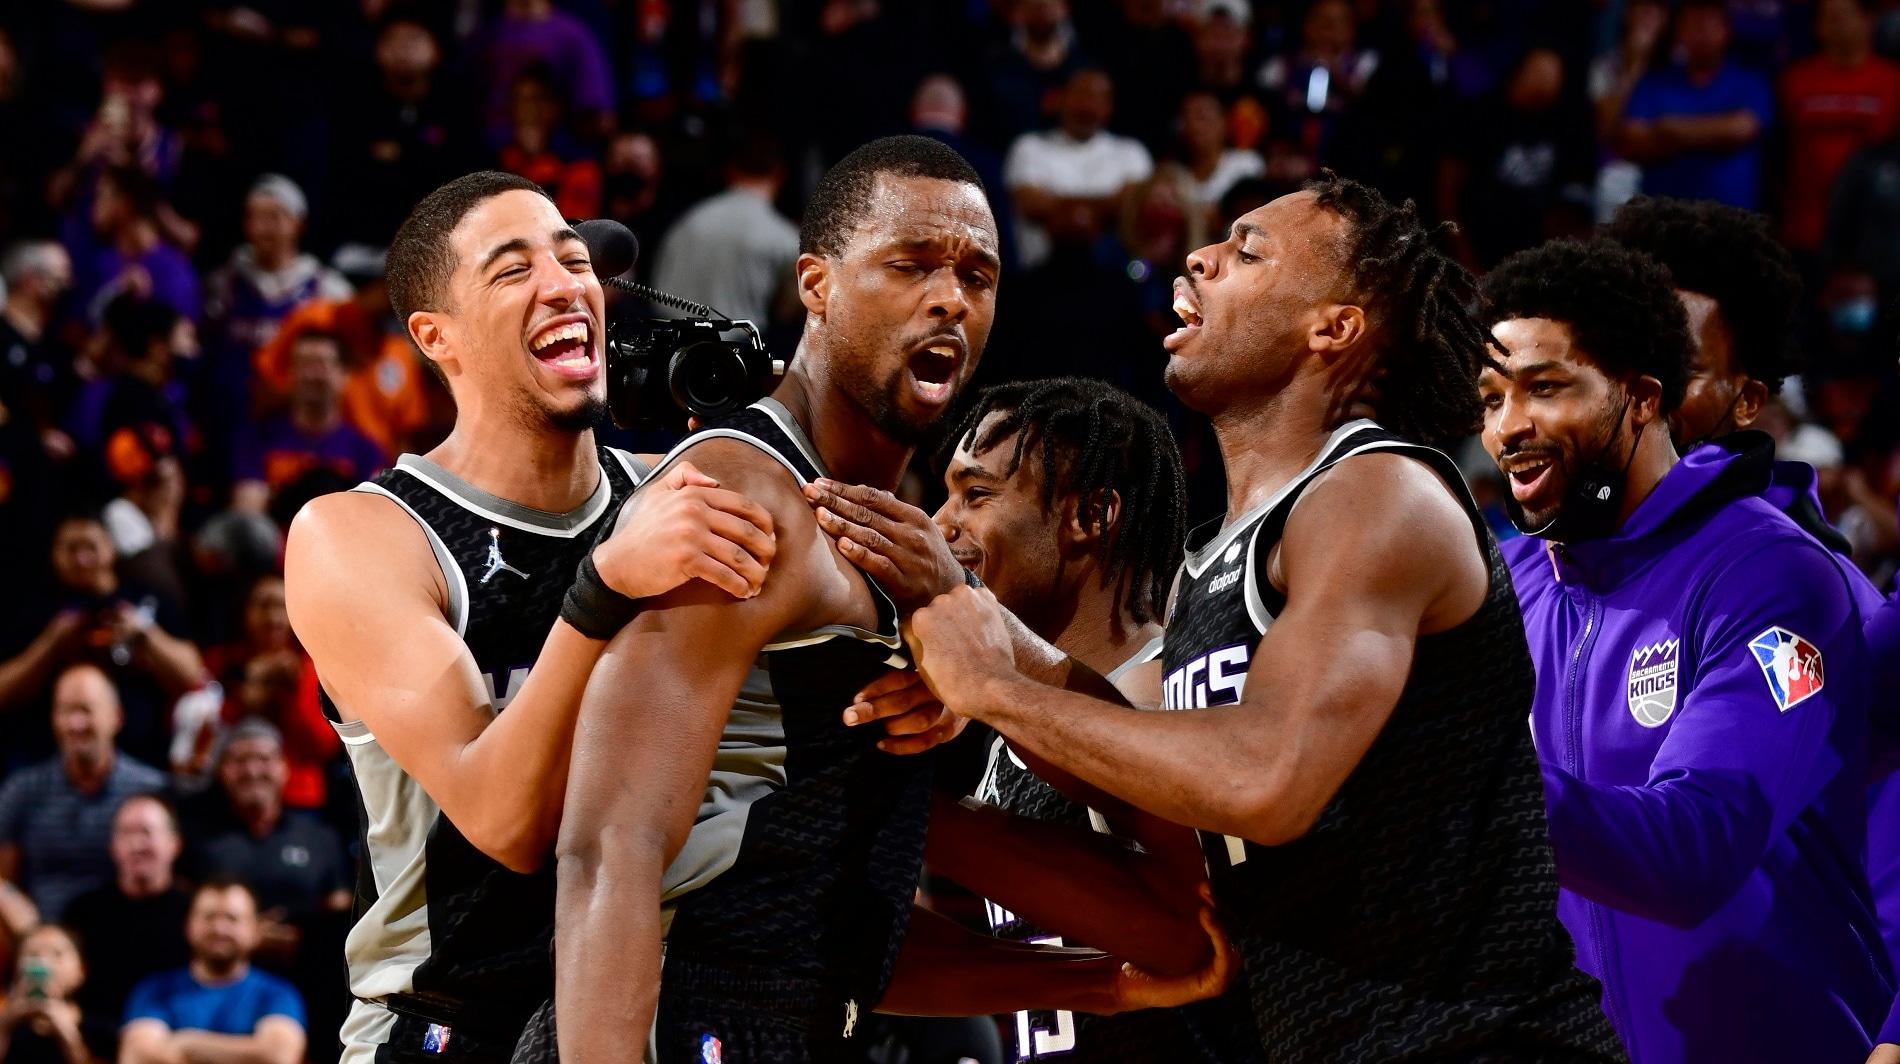 Full Focus: Barnes' buzzer-beating 3 sinks Suns